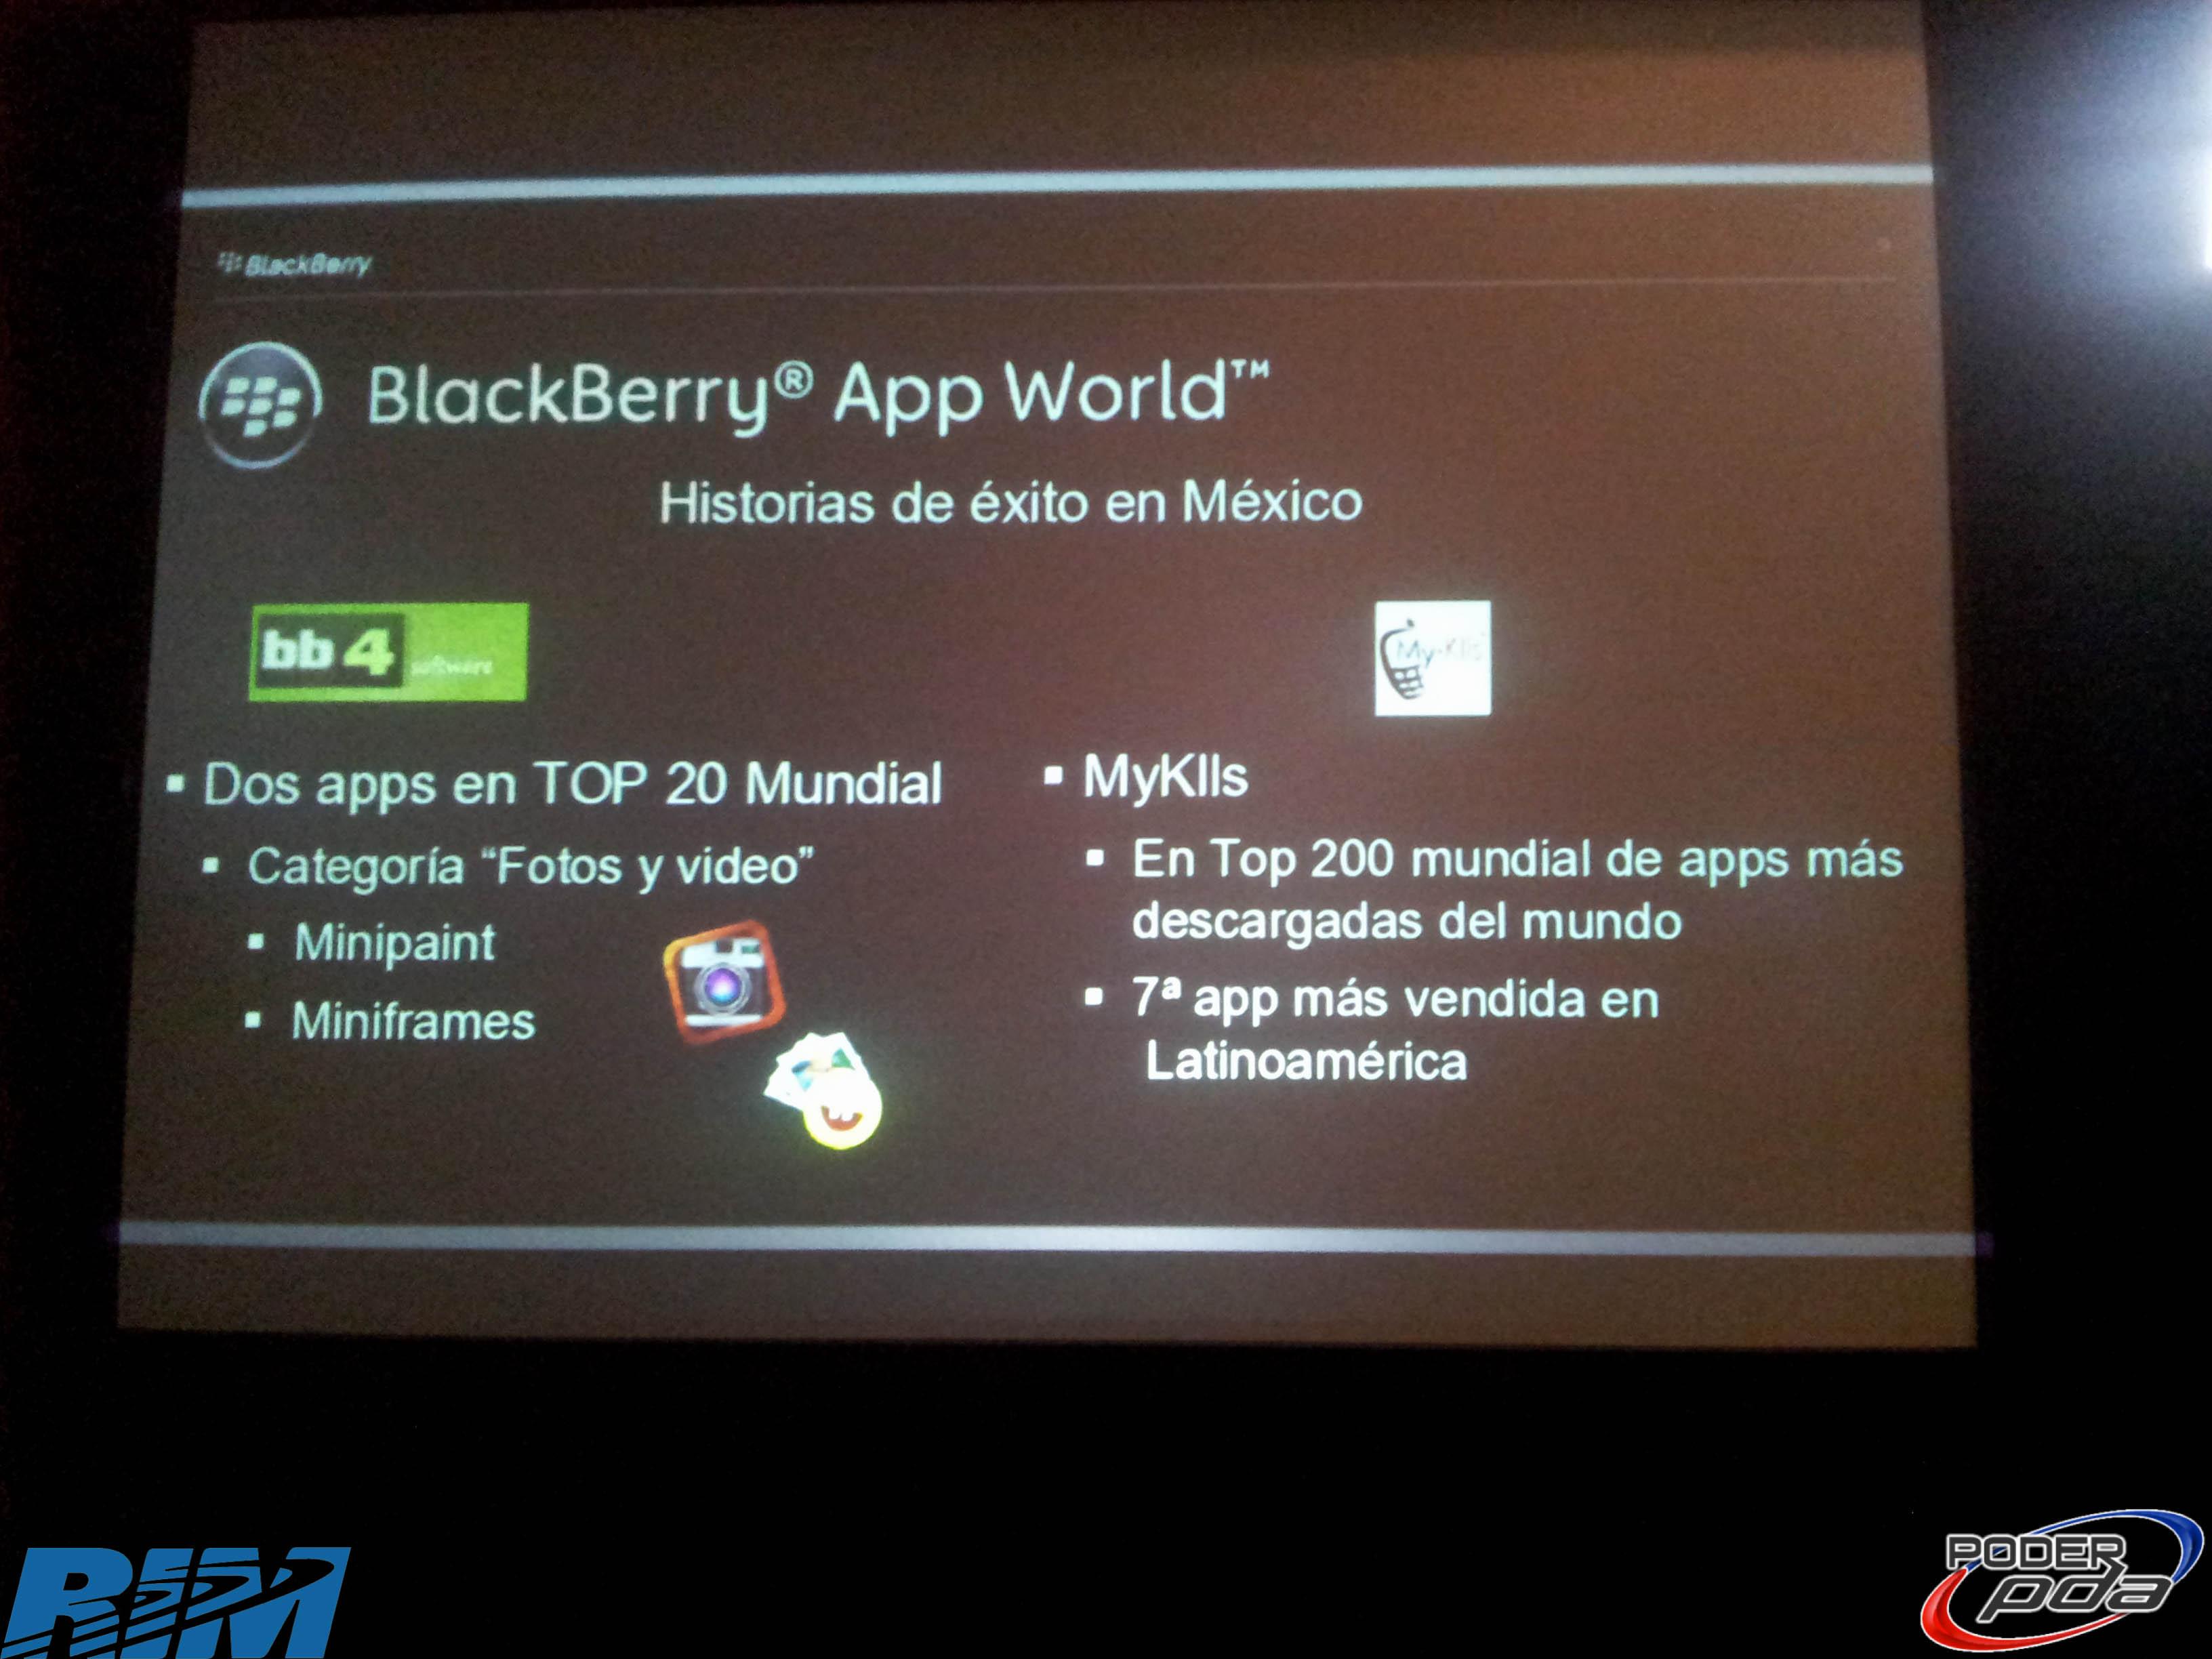 Vision-RIM-BlackBerry-Mexico-2012-20